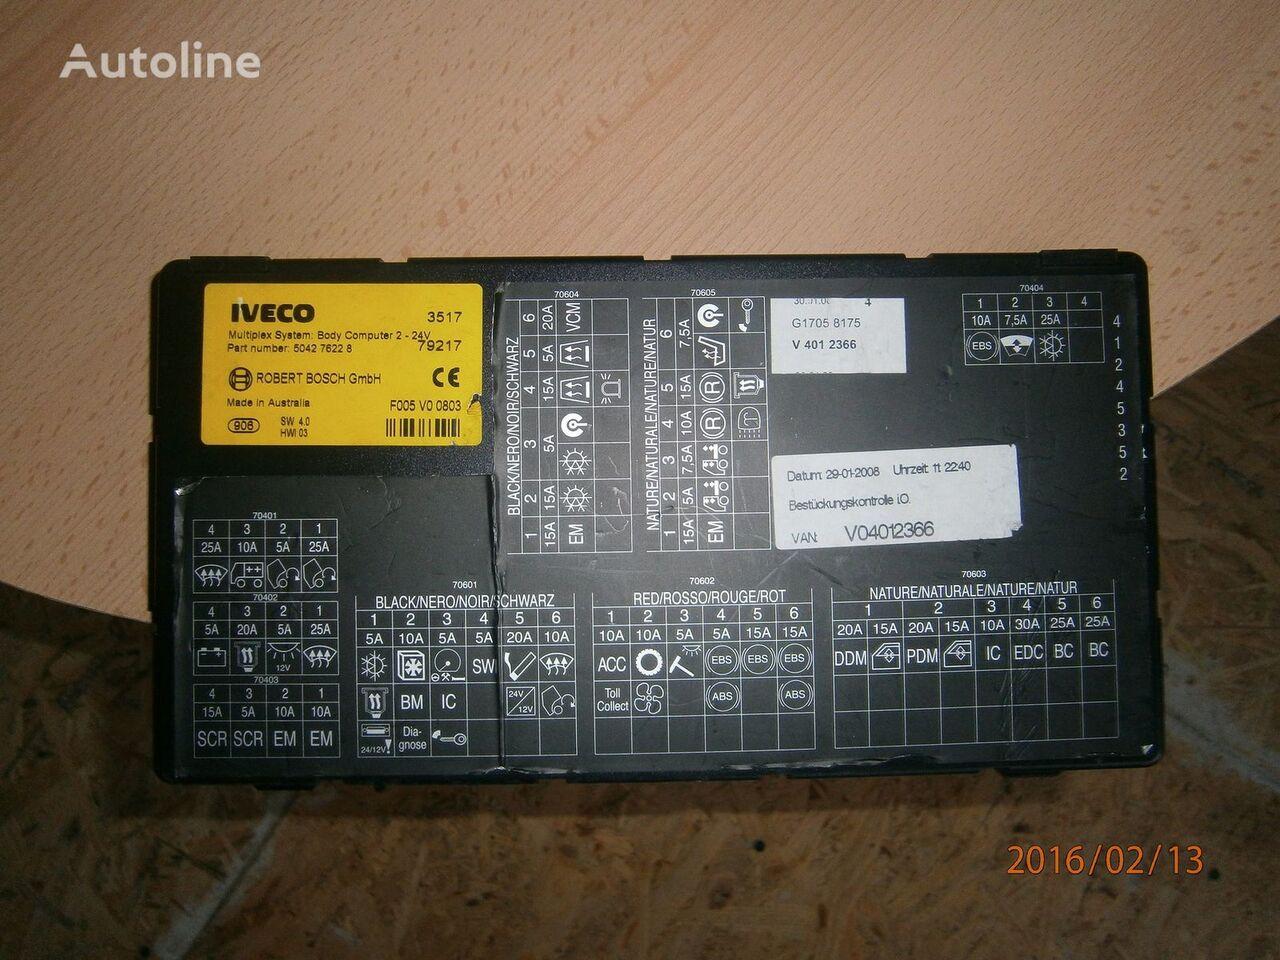 блок за управление IVECO EURO5 Multiplex system body computer 504276228 за влекач IVECO Stralis